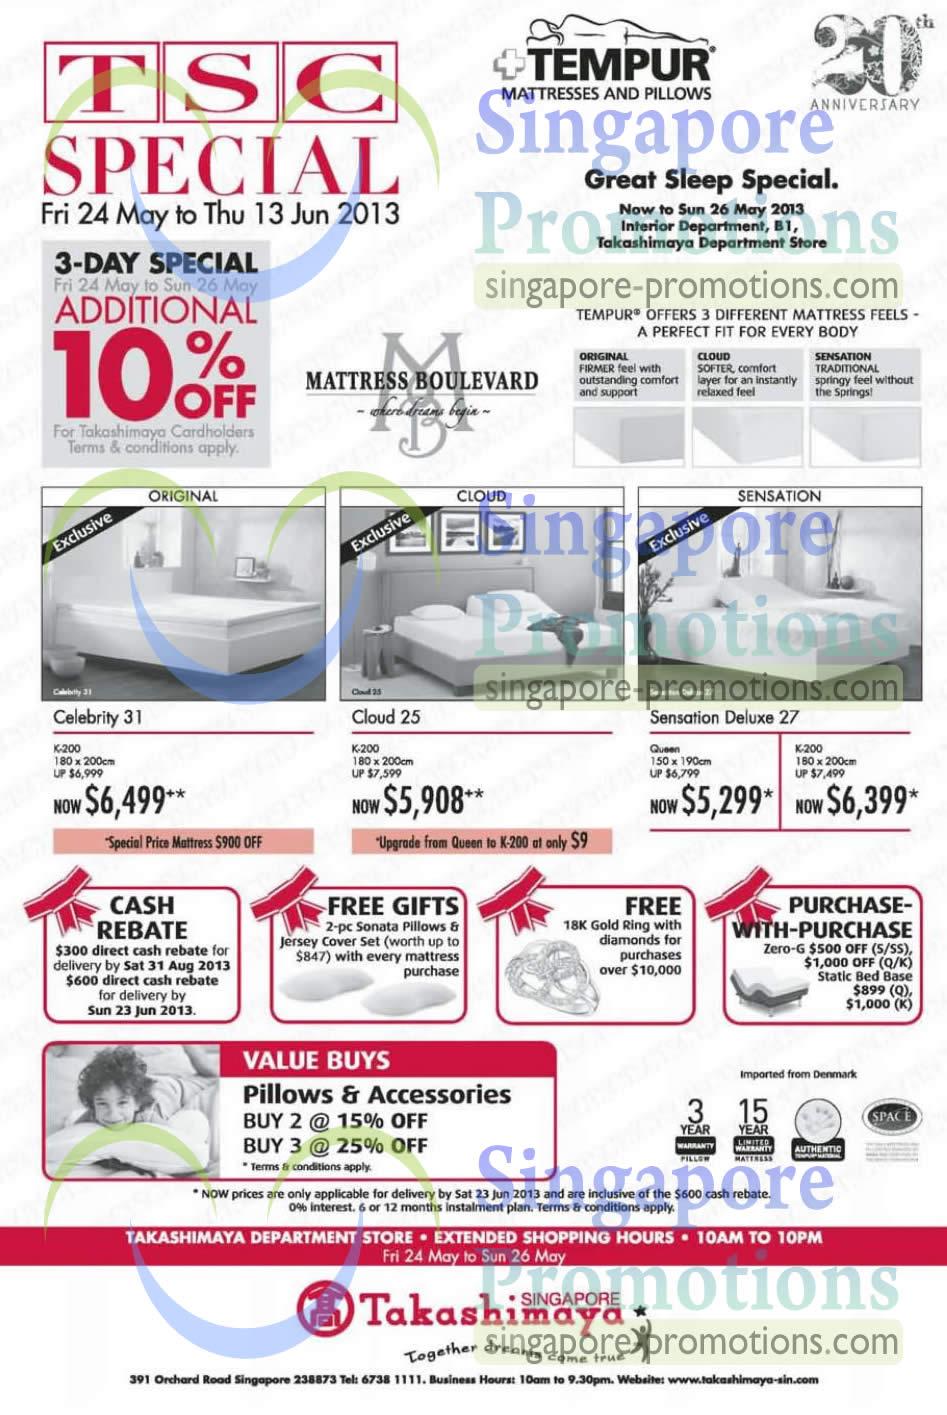 tempur celebrity 31 mattress cloud 25 mattress sensation. Black Bedroom Furniture Sets. Home Design Ideas